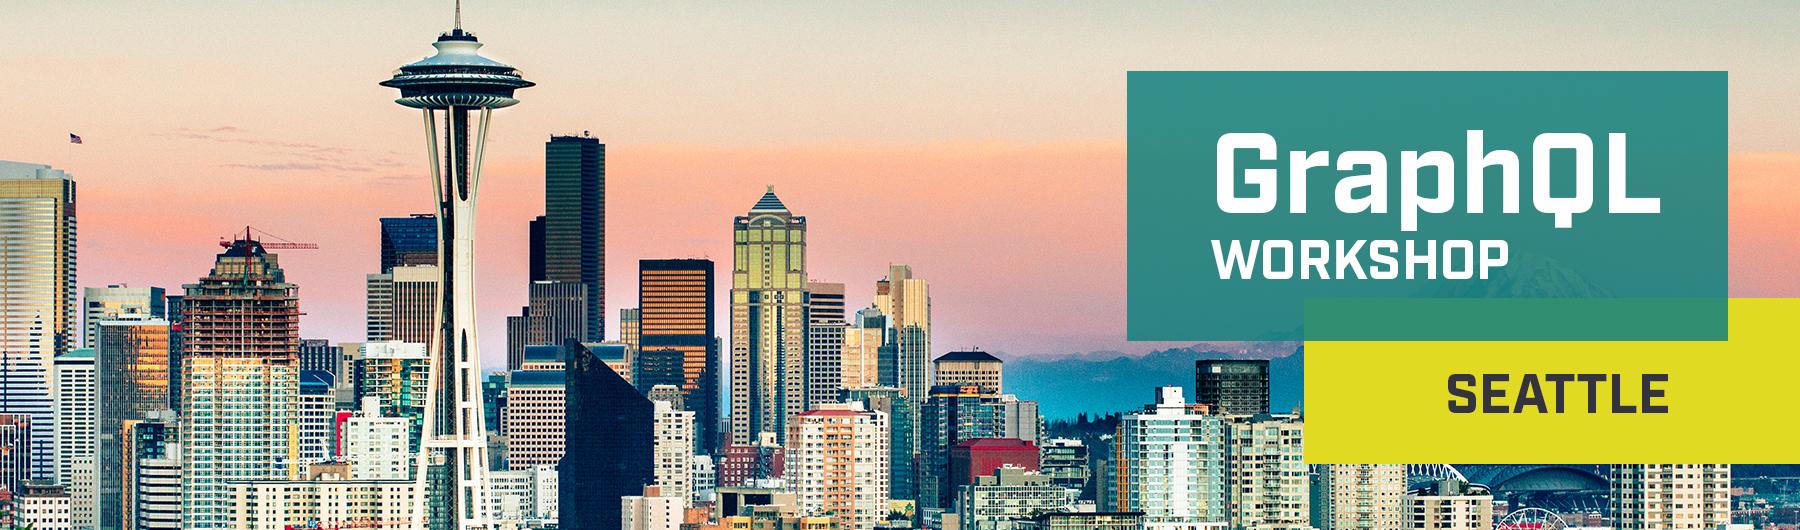 GraphQL Workshop in Seattle